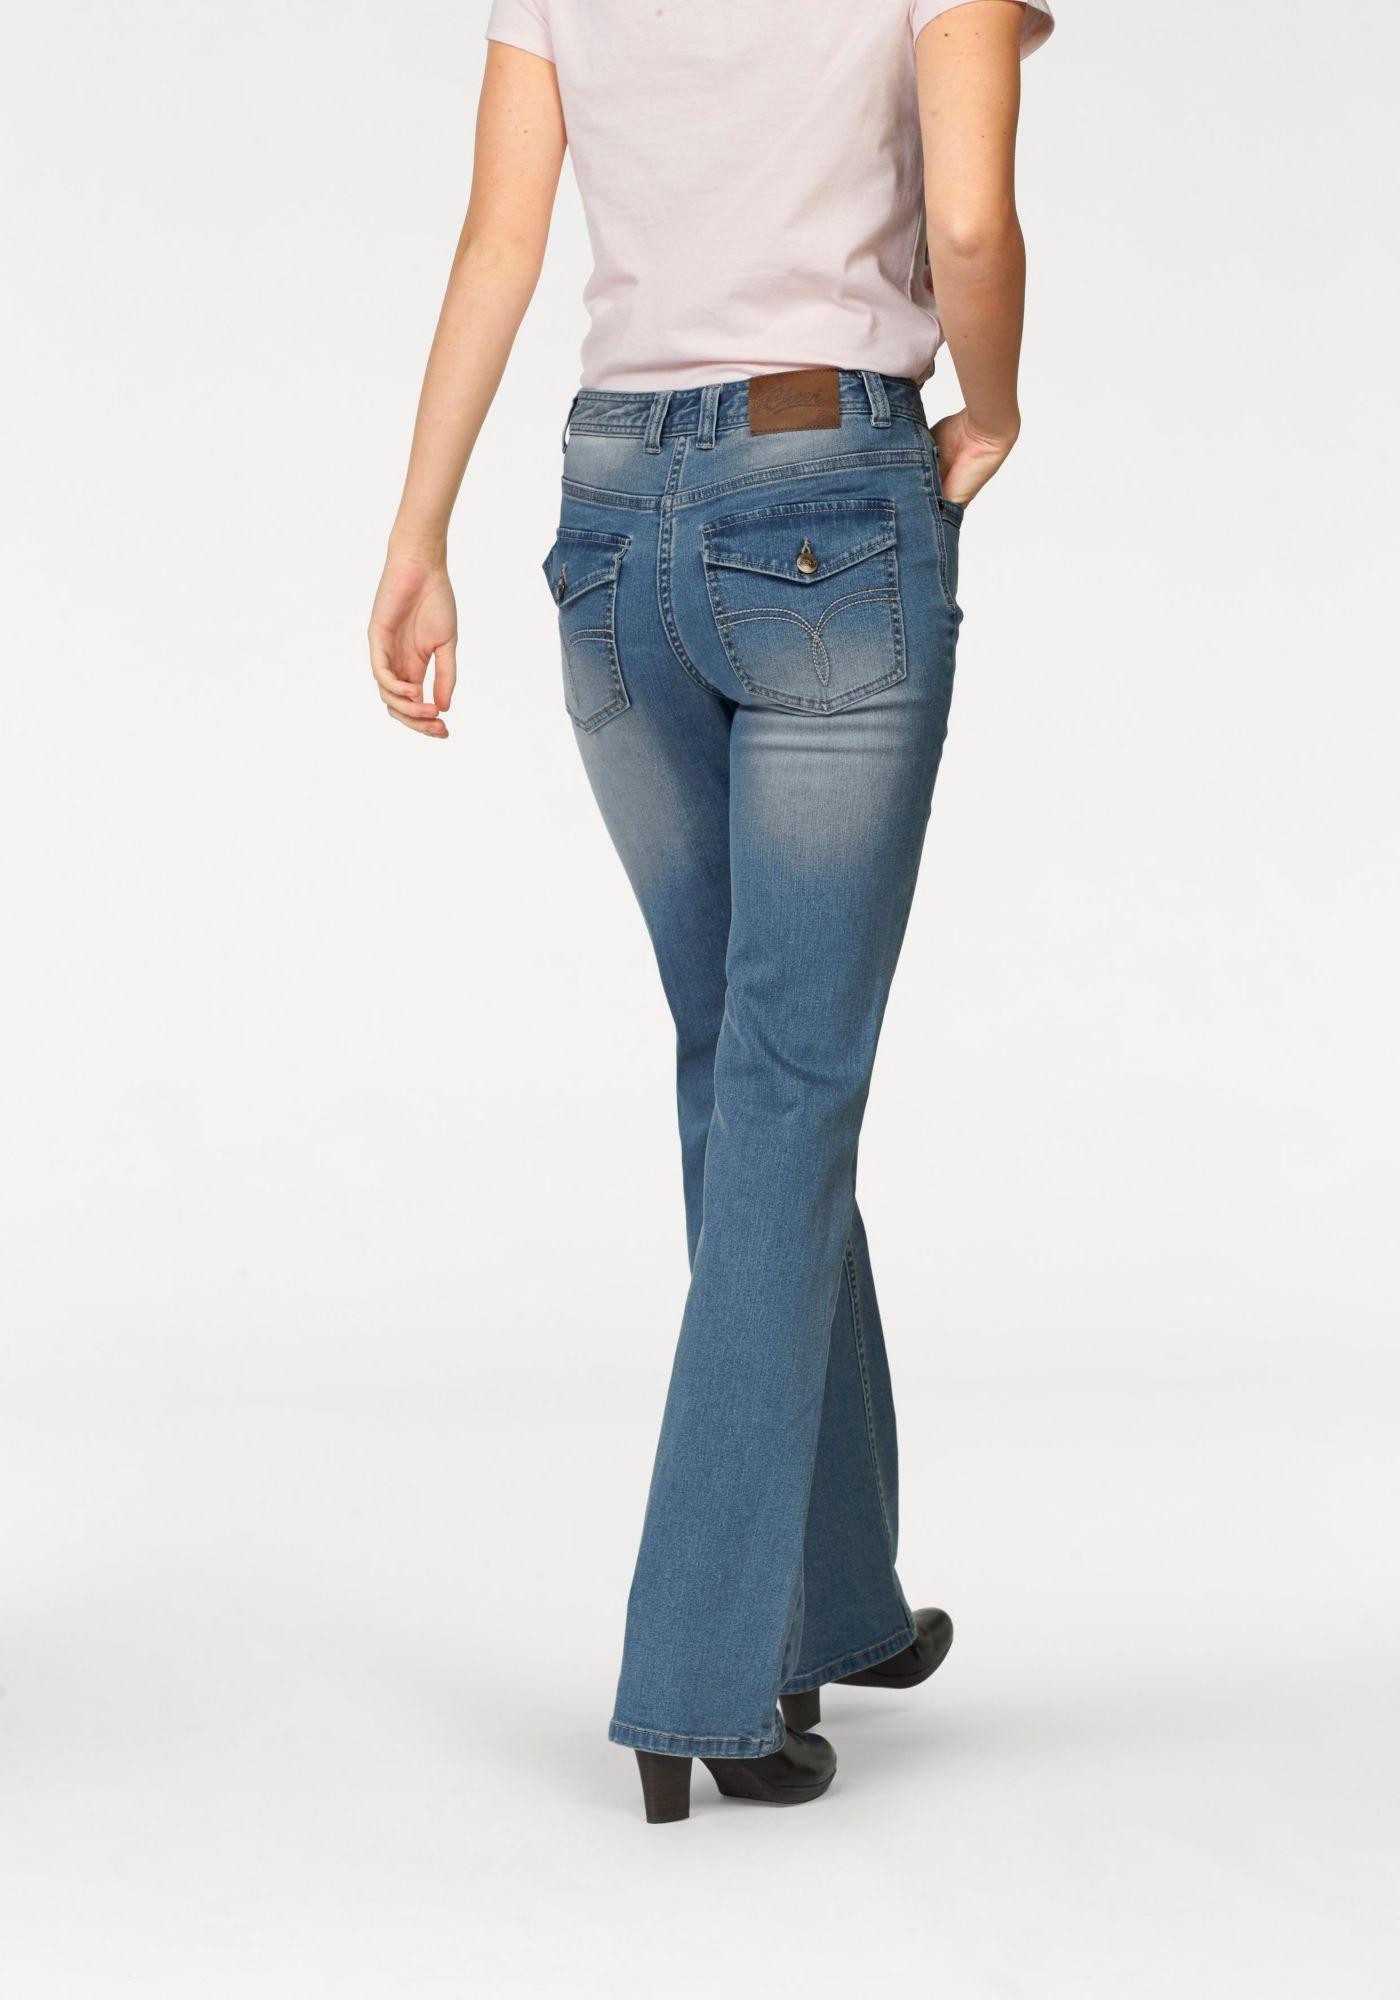 CHEER Cheer Bootcut-Jeans